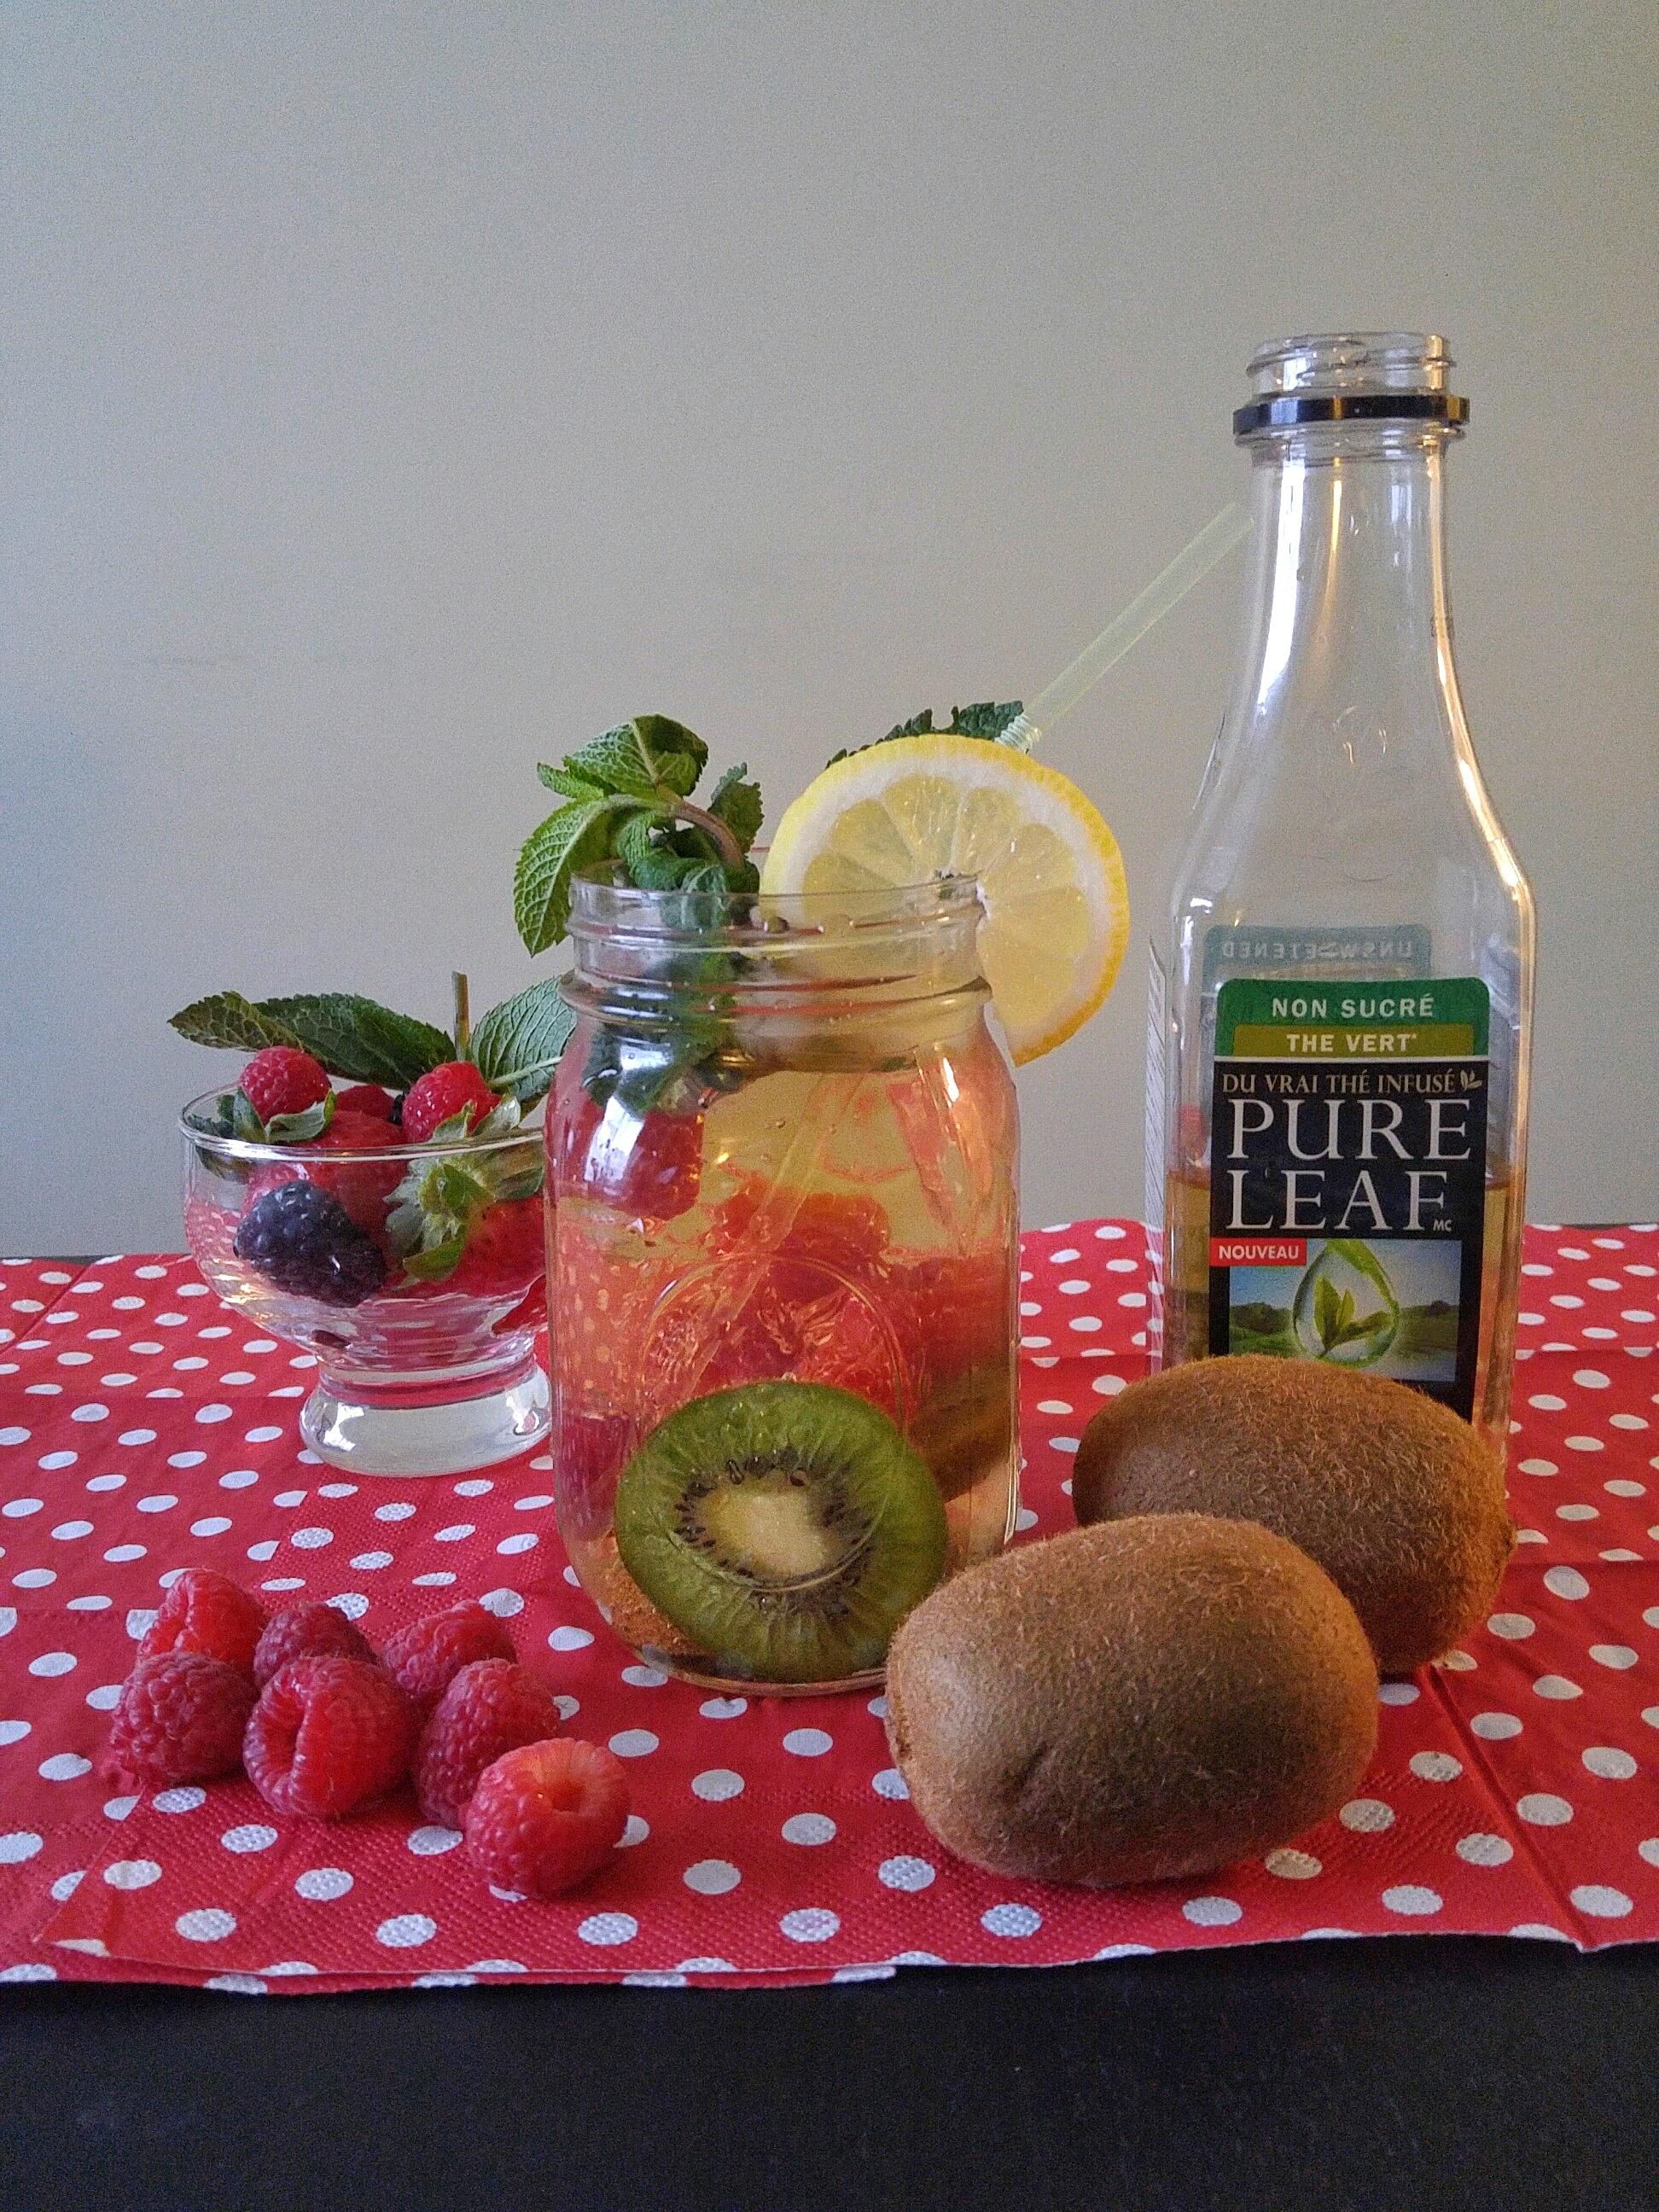 Kiwis + Raspberries mixed with Unsweetened Pure Leaf Green Tea